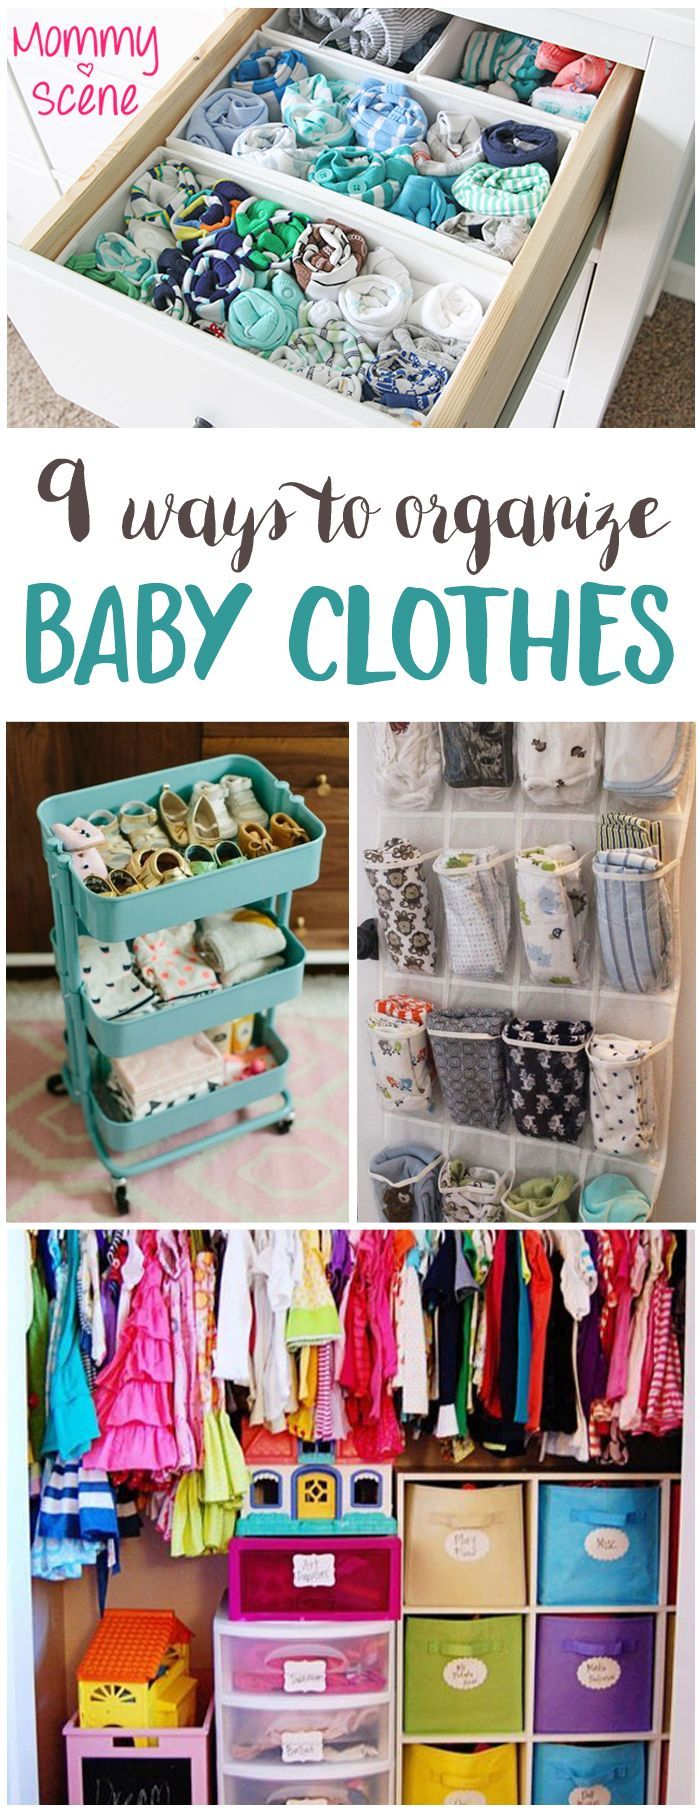 best 25 nursery organization ideas on pinterest nursery baby room and baby nursery organization. Black Bedroom Furniture Sets. Home Design Ideas